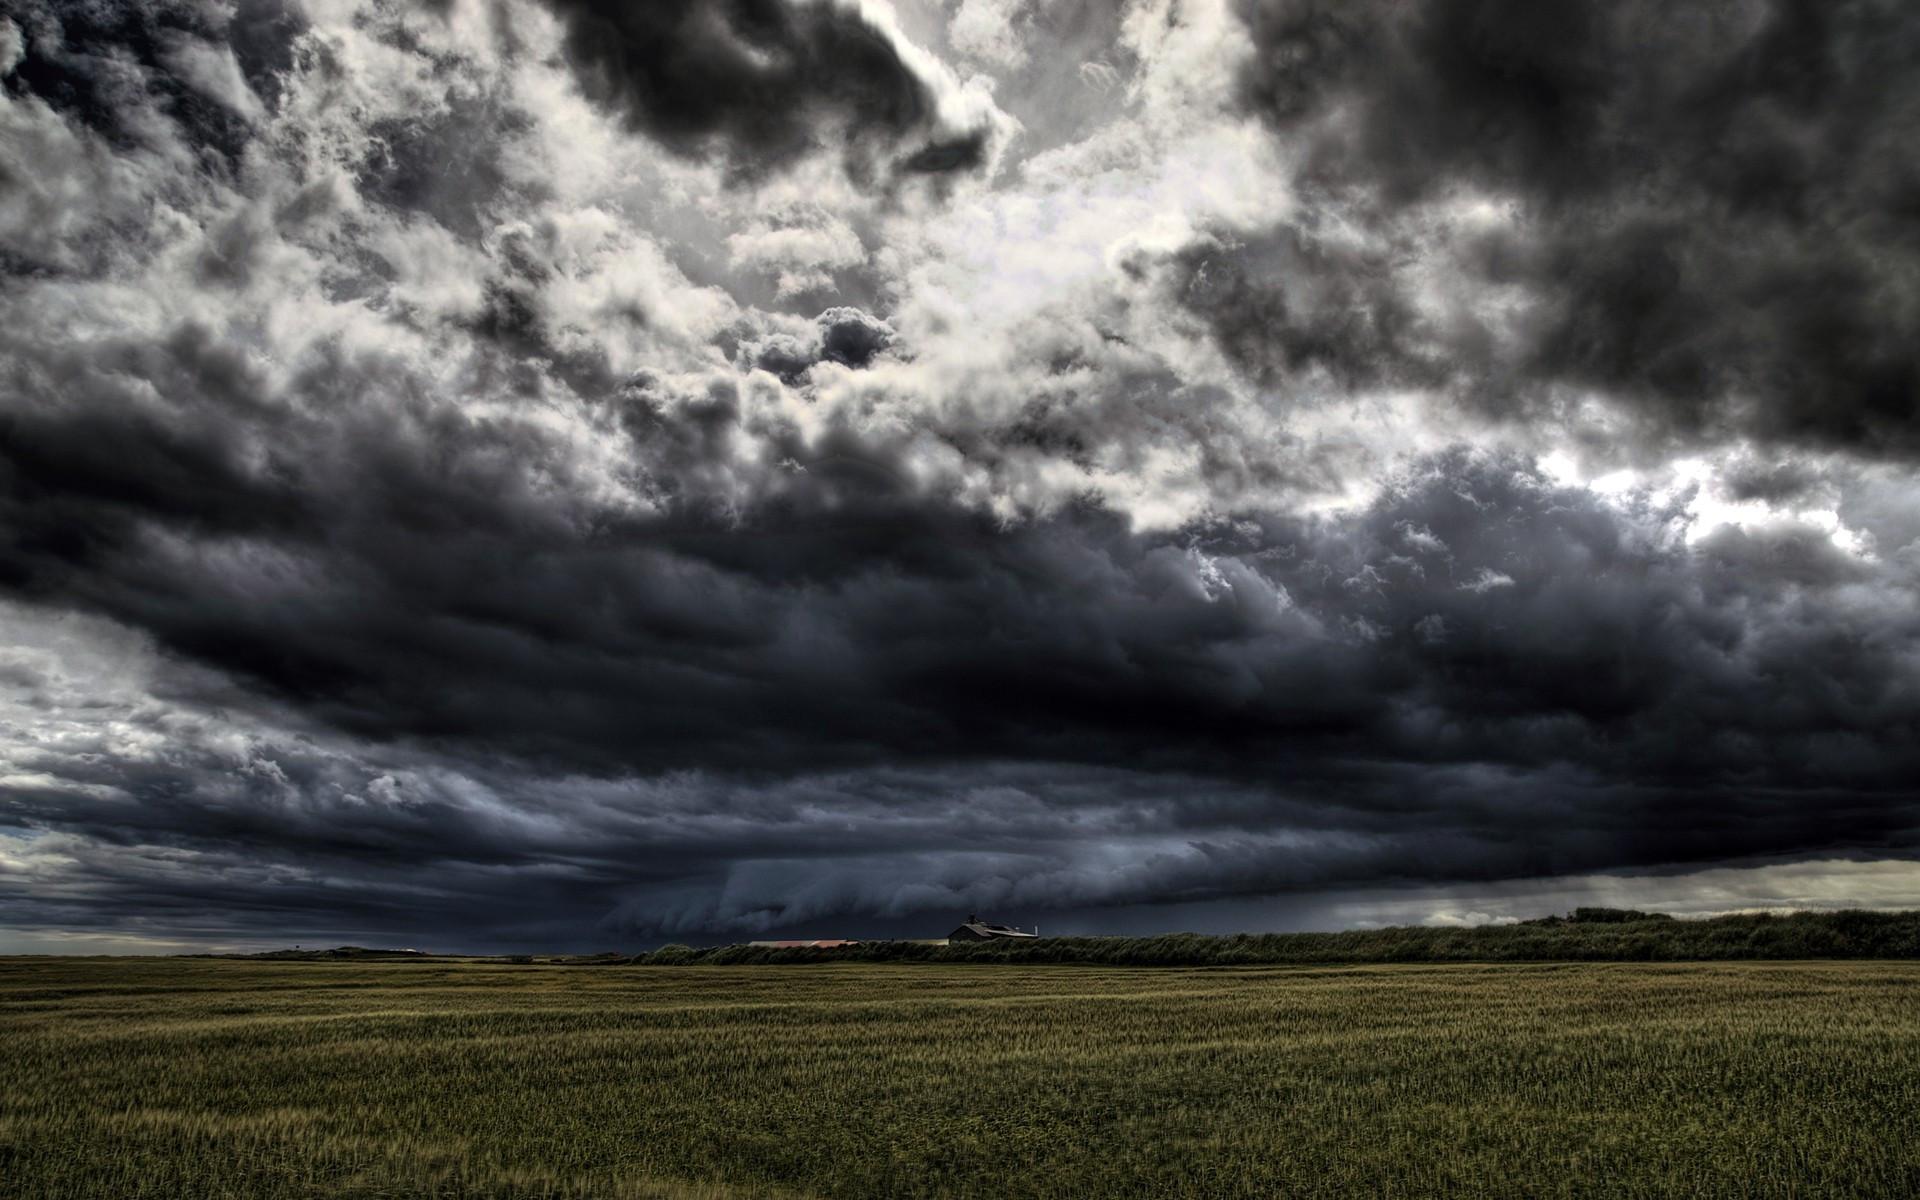 Storm Clouds Wallpapers: Stormy Skies Wallpaper